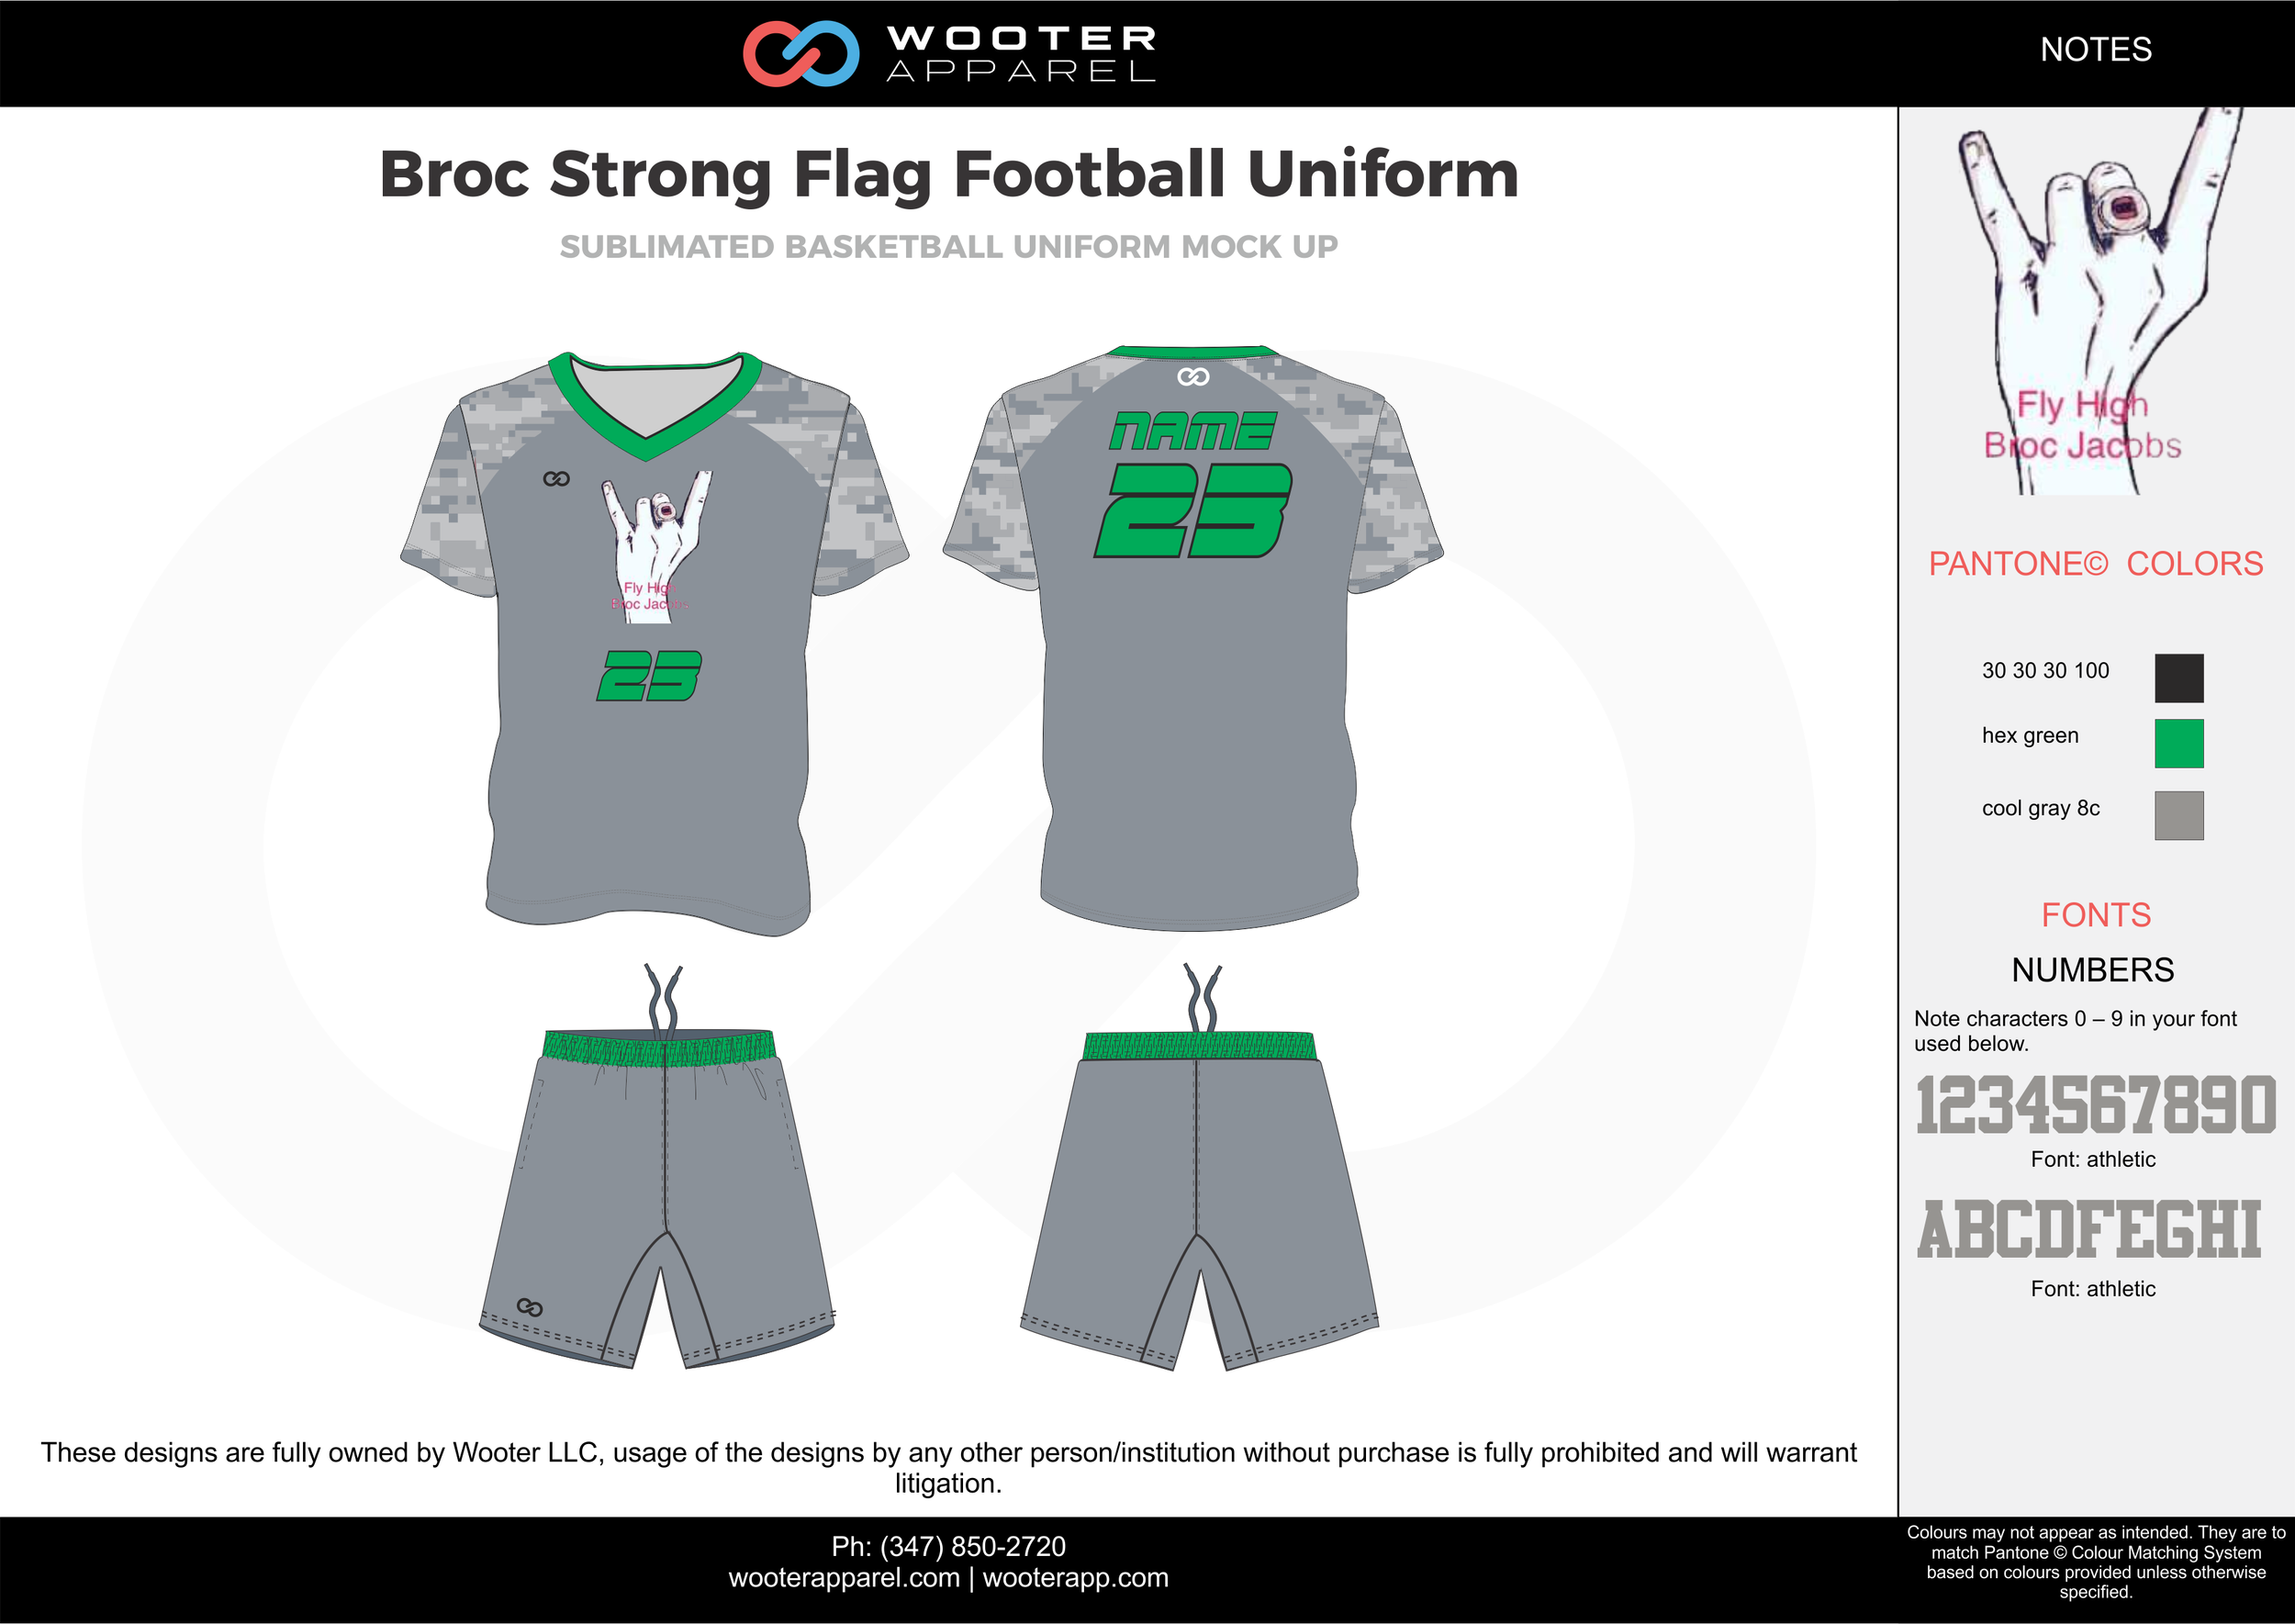 BROC Strong Flag Football Uniform gray green blue white flag football uniforms jerseys shorts